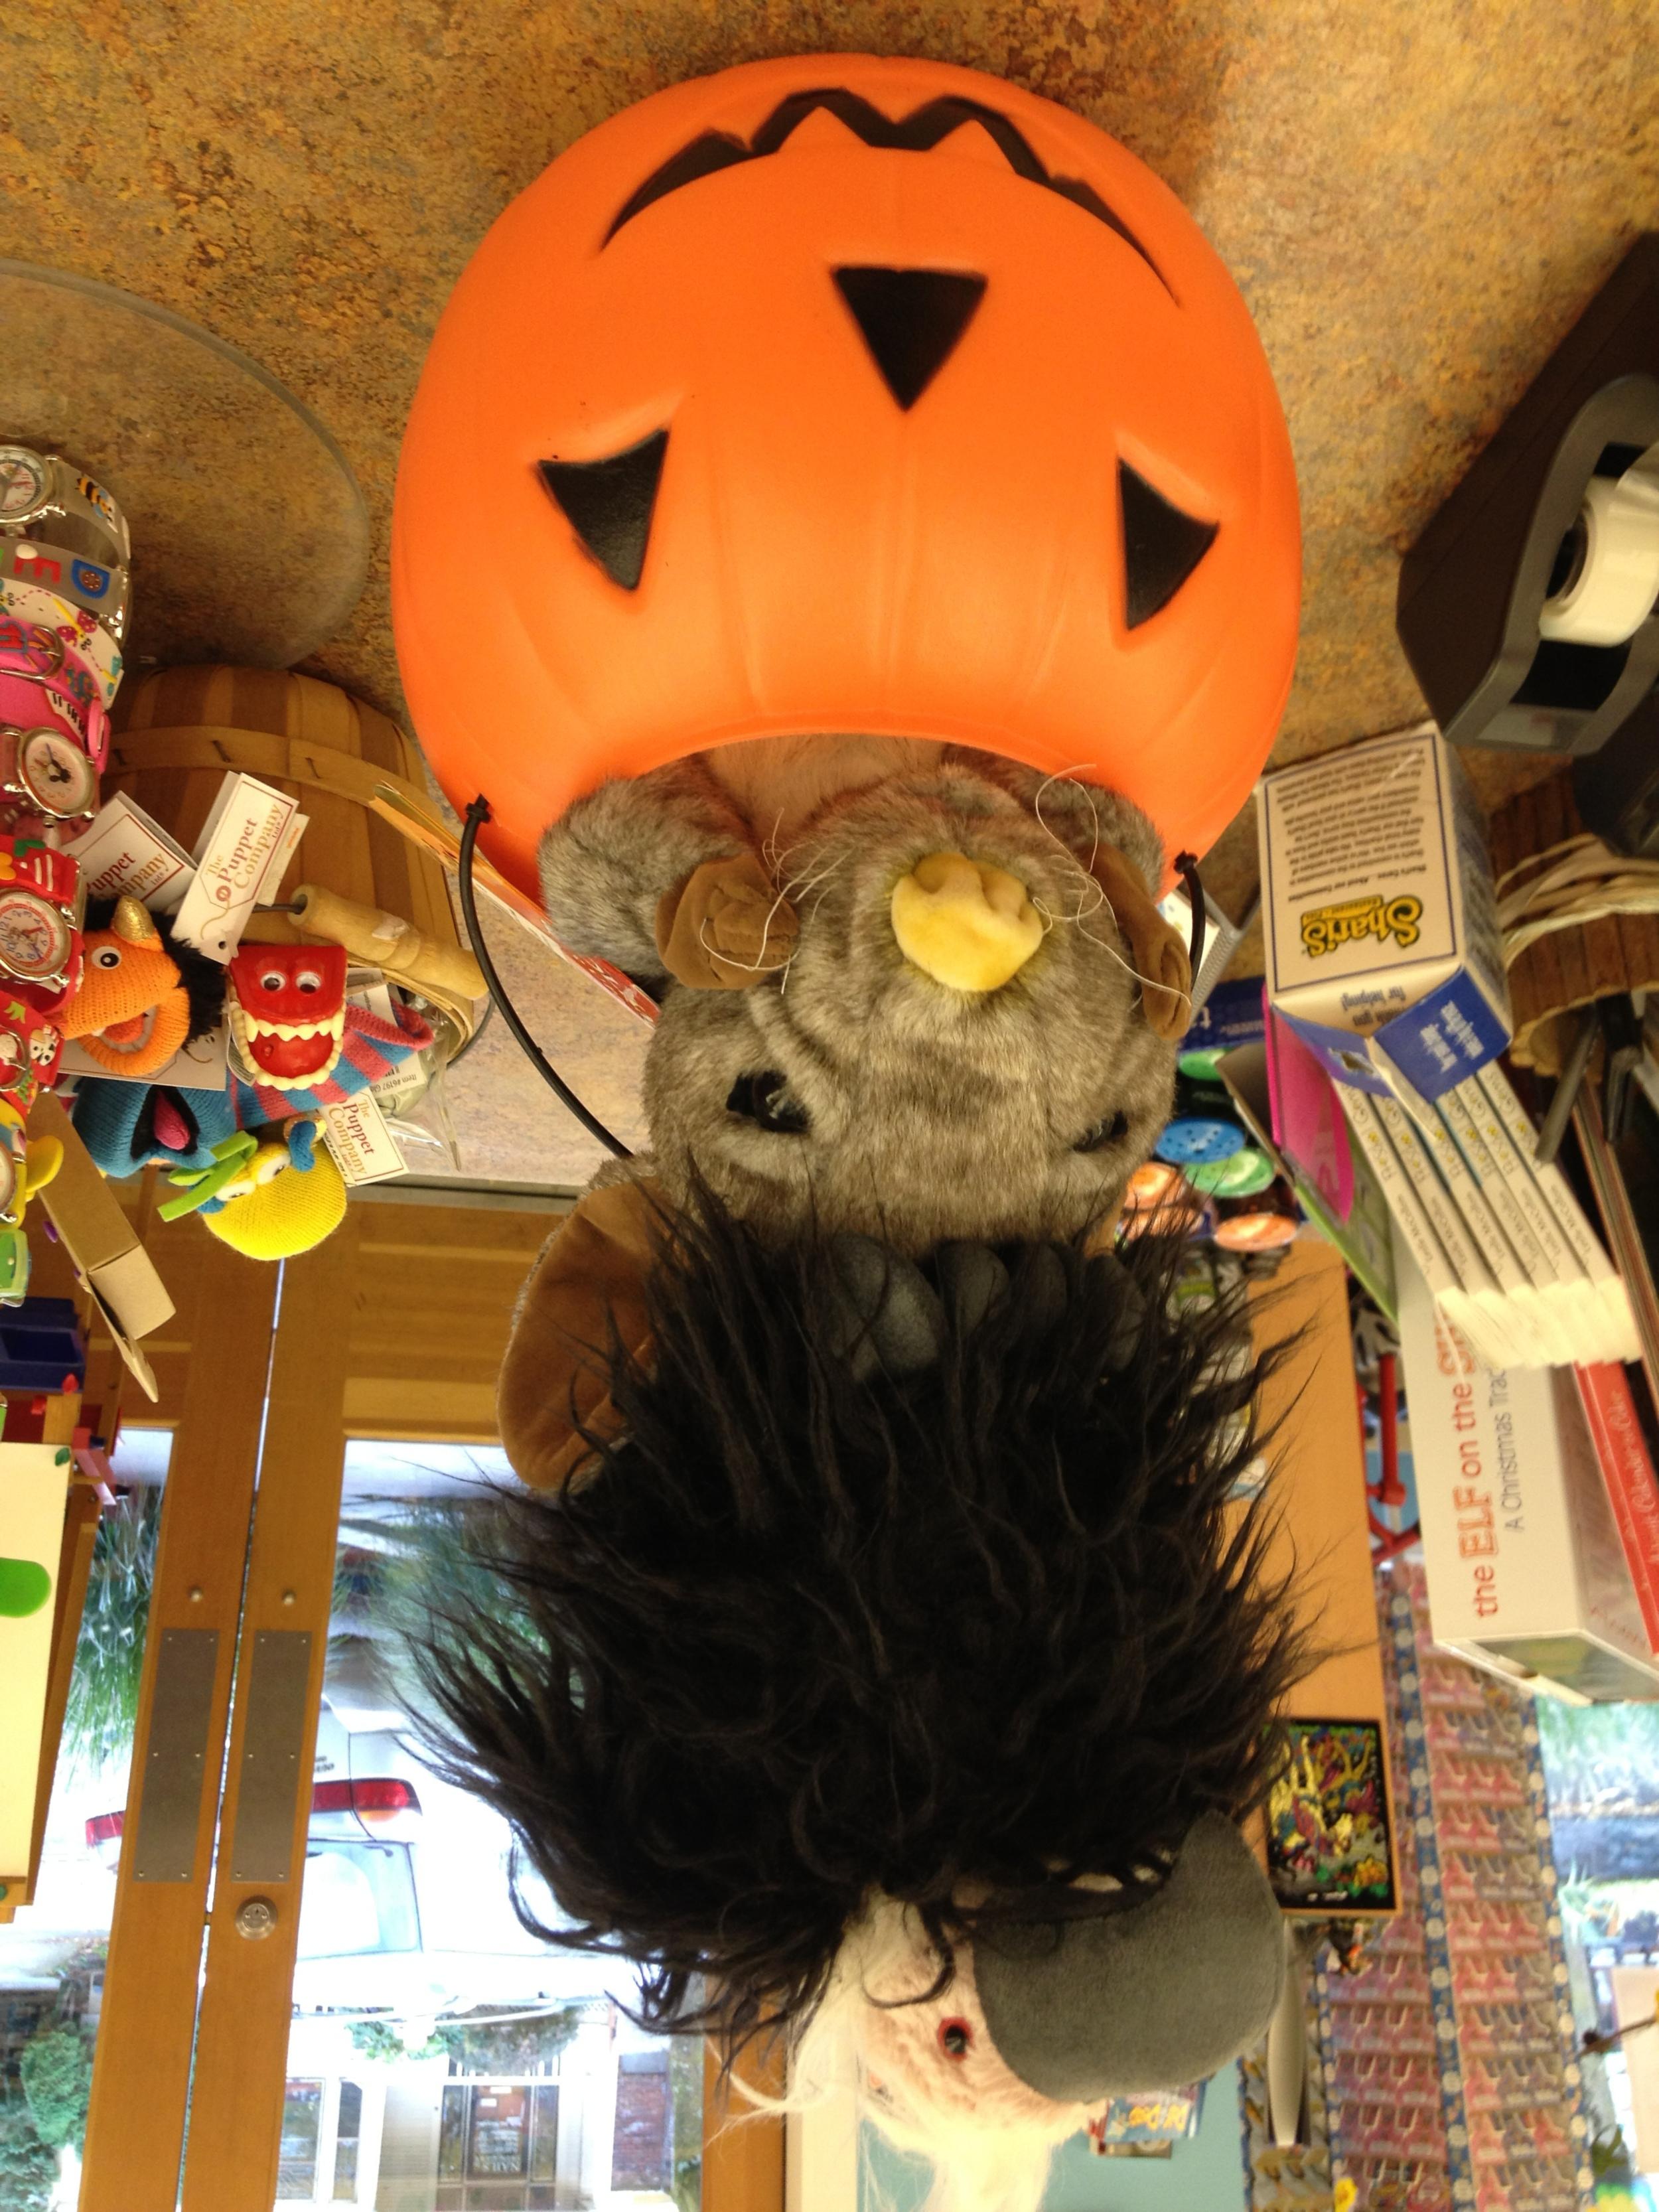 Portland_Toys_halloween_totem_pole